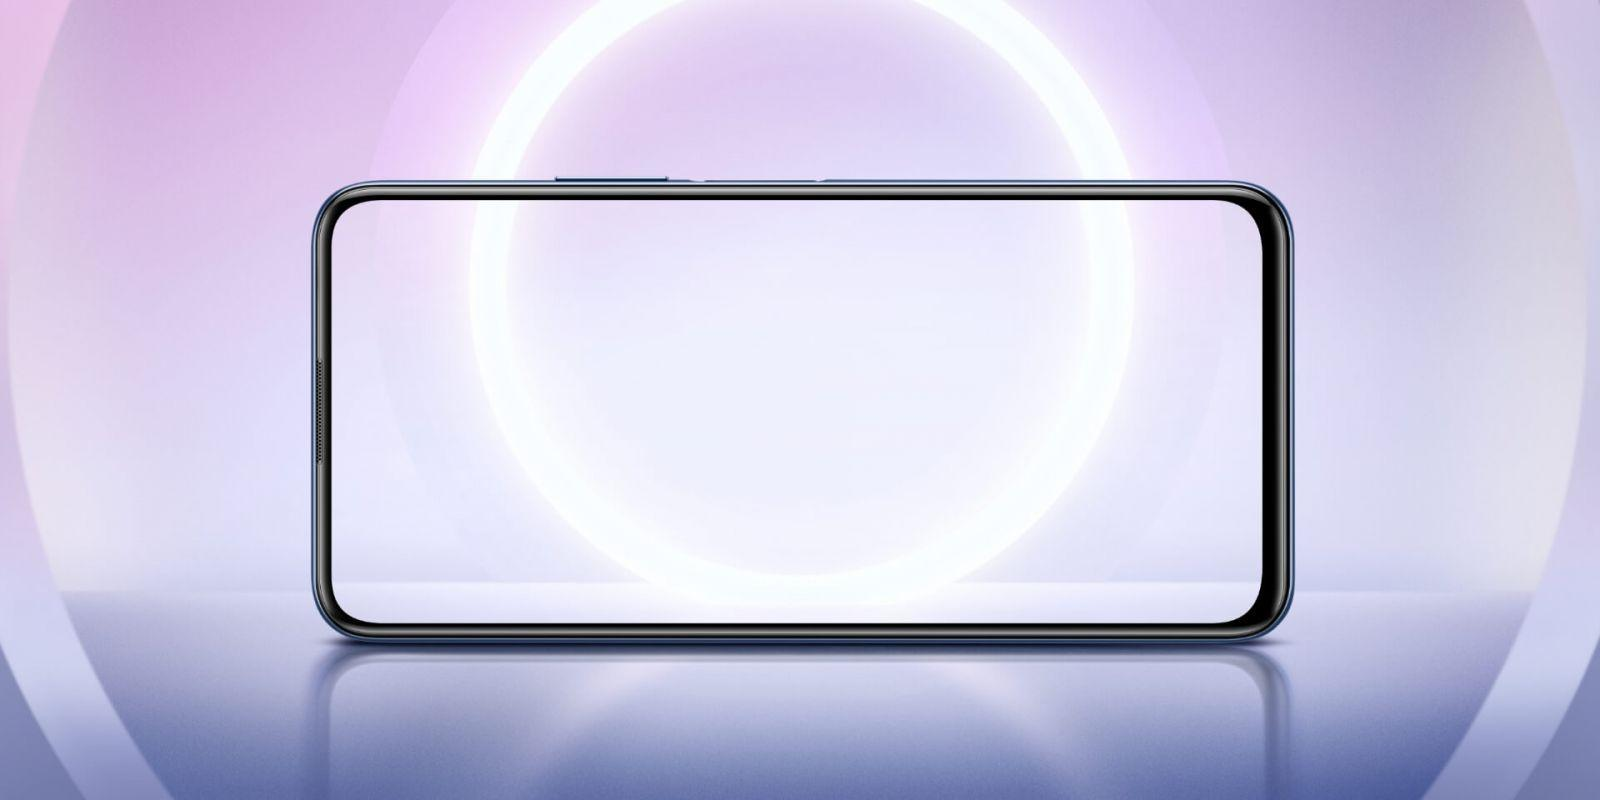 Huawei представила смартфон Huawei Y9a (huawei y9a fullview display)